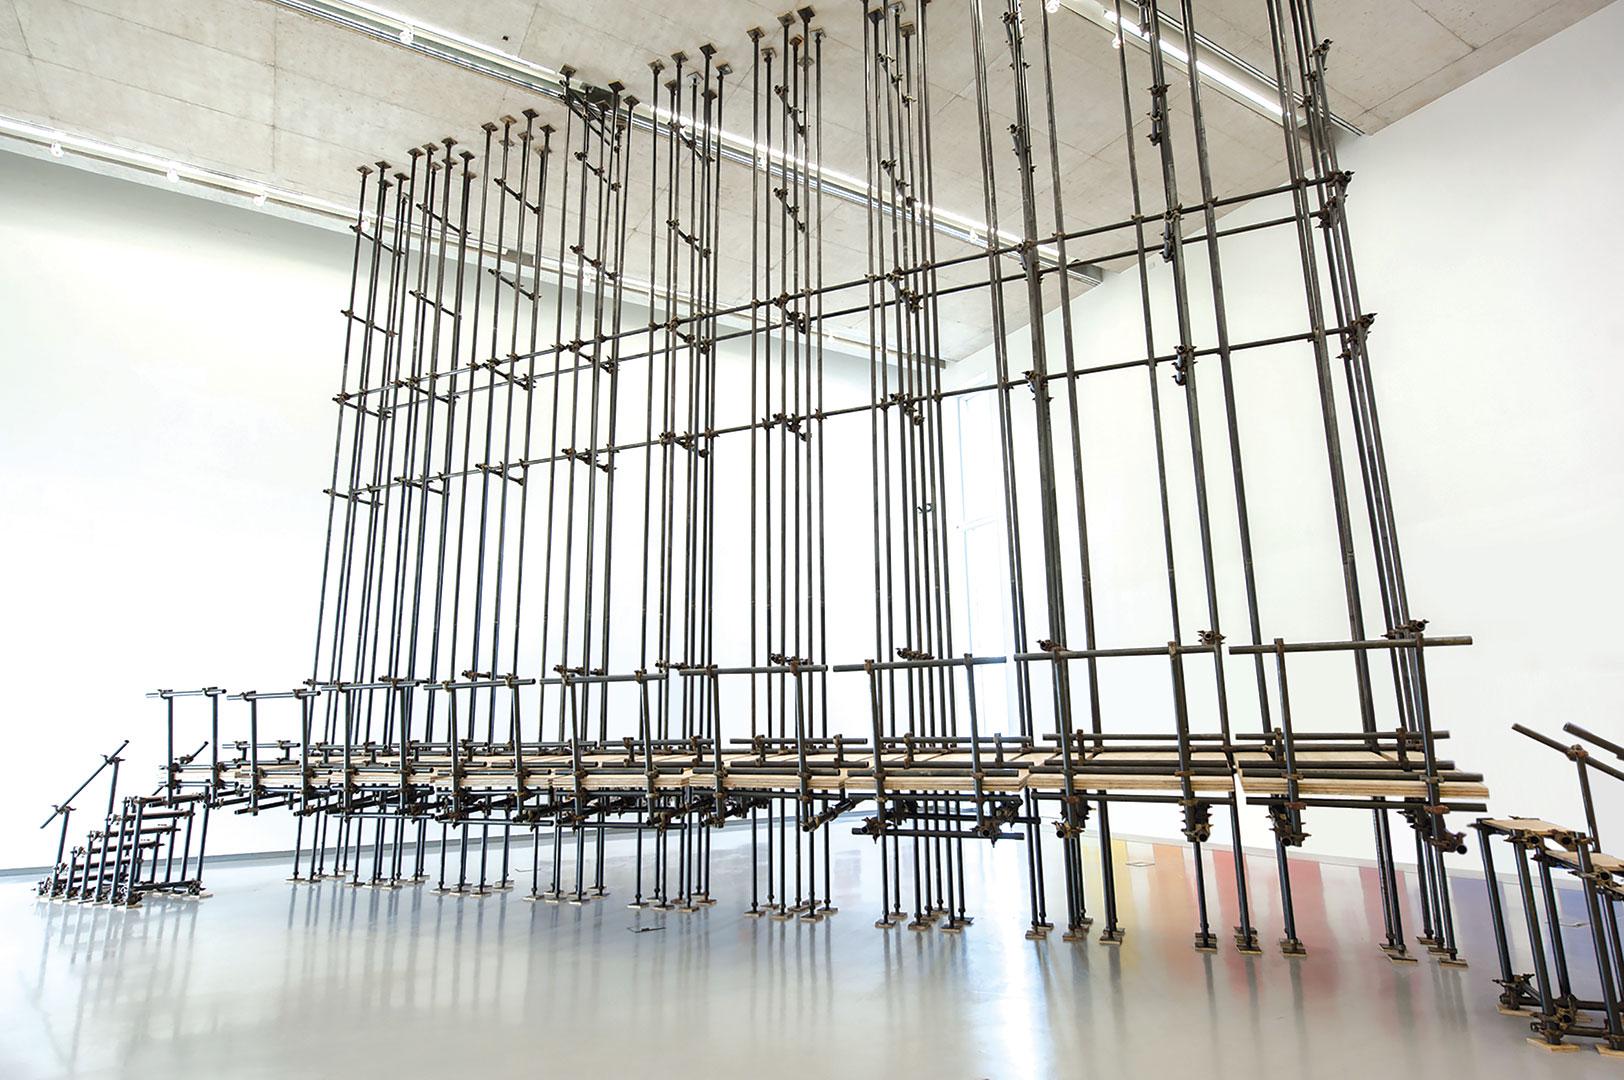 Prueba de tensión | Plywood, iron pipes and scaffolding clamps | 9,00 x 2,44 x 11,6 m